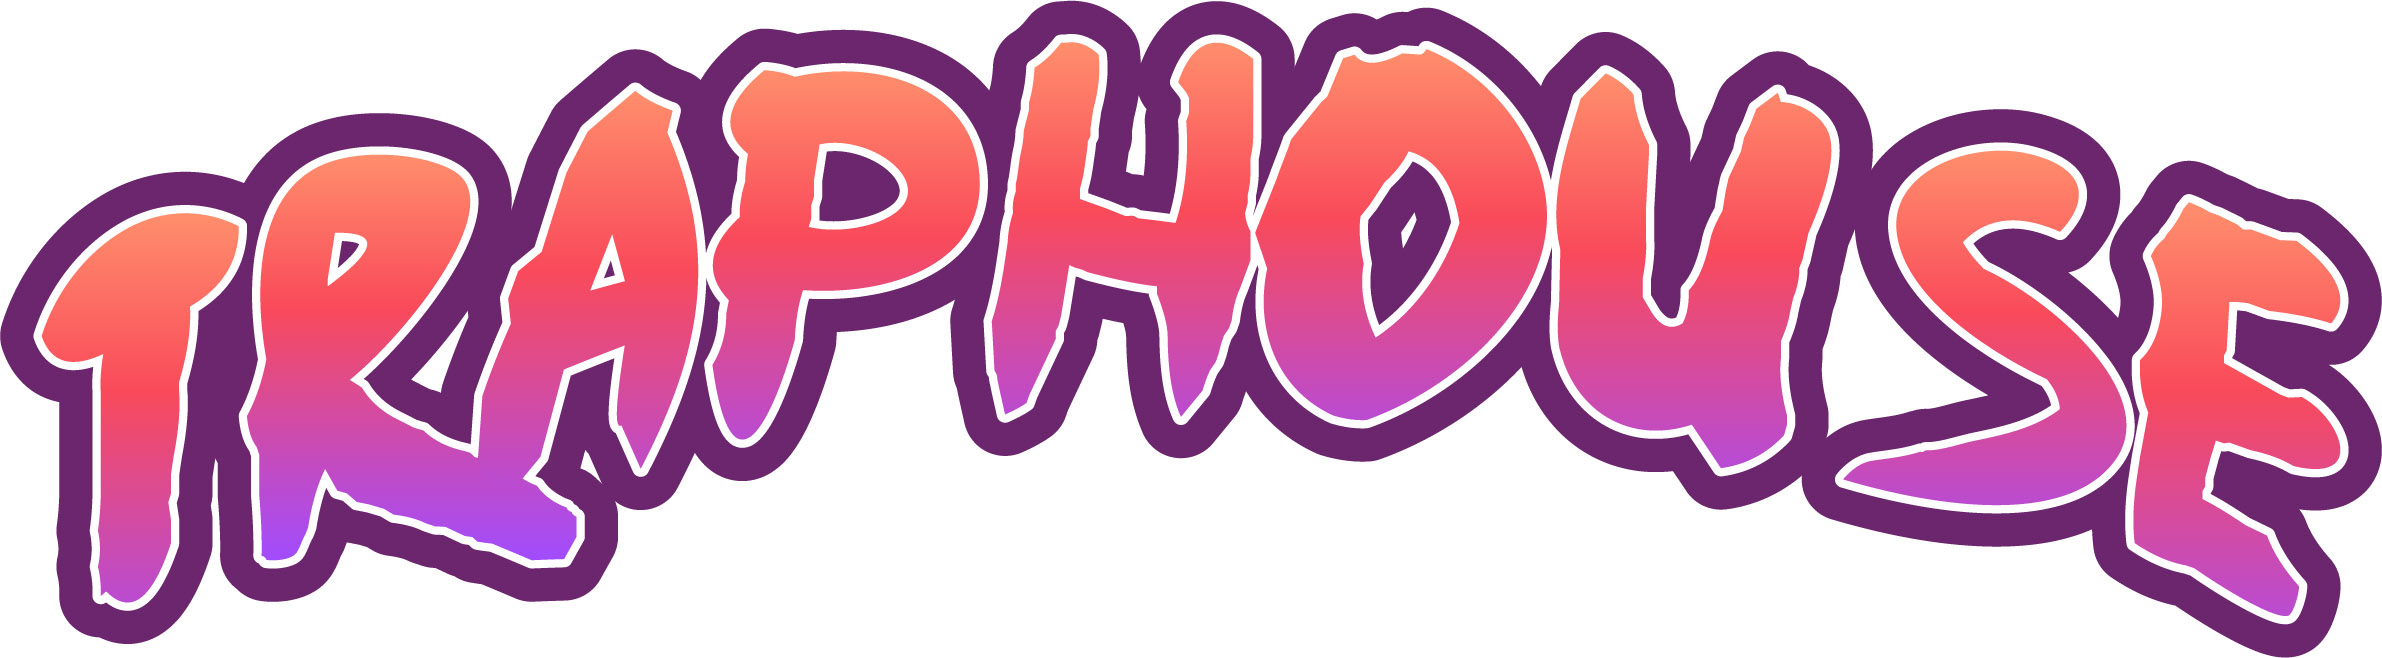 Logo traphouse_2